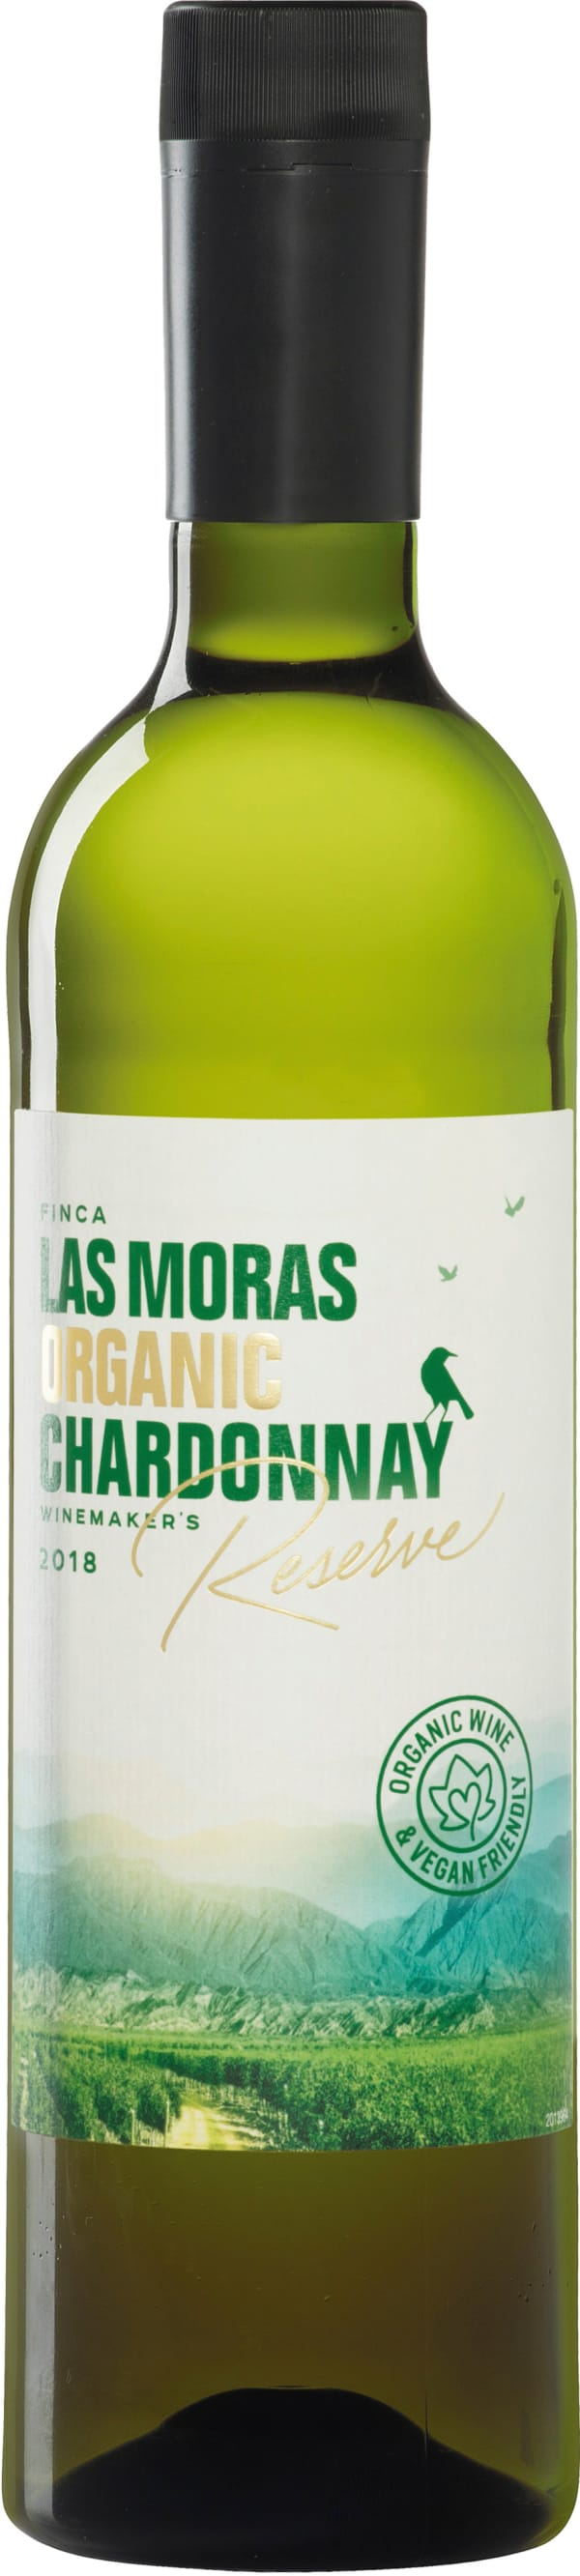 Finca Las Moras Organico Reserve Chardonnay 2016 plastic bottle